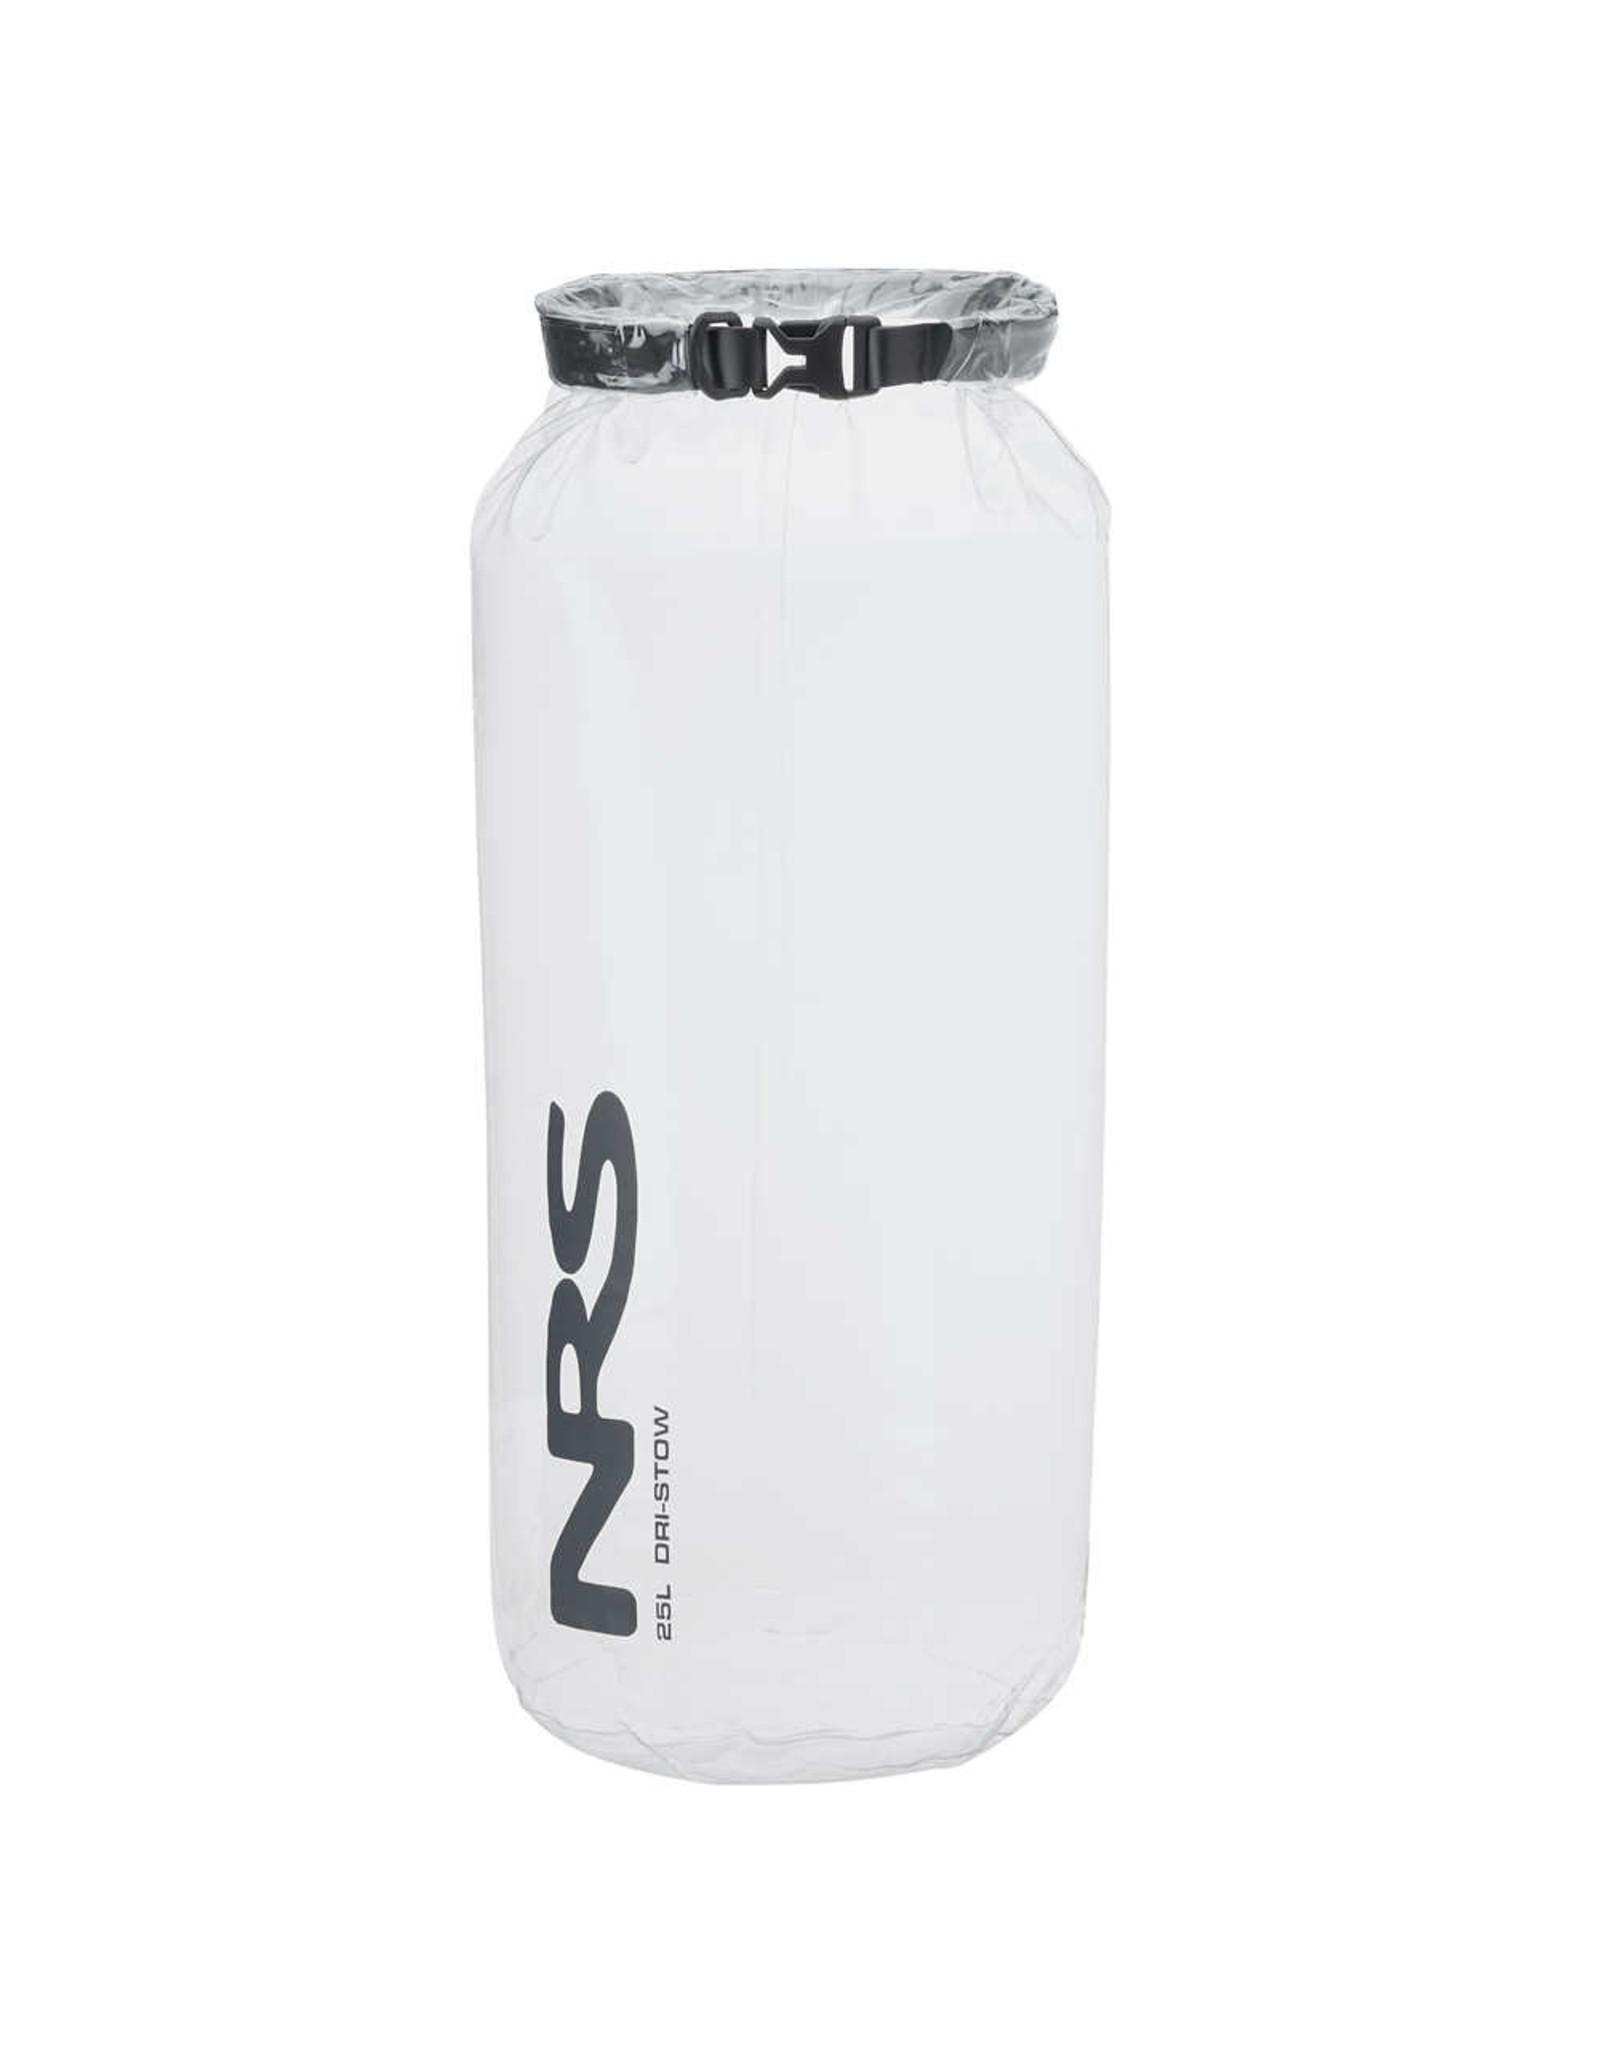 NRS NRS Dri-Stow Dry Sacks Clear 25L